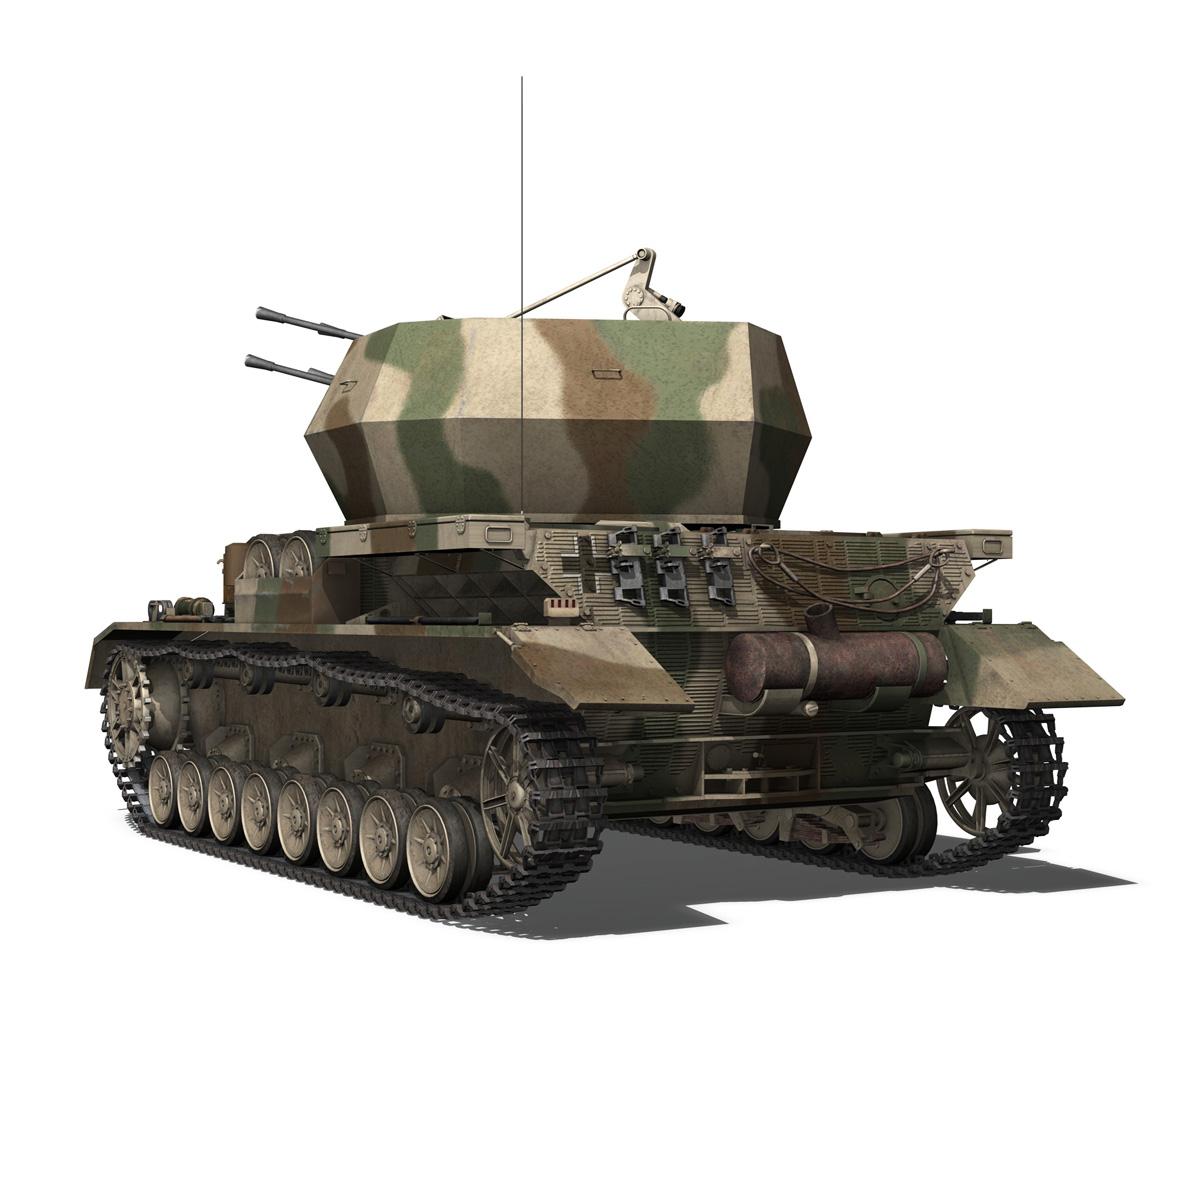 flakpanzer iv – wirbelwind – spzjgabt 654 3d model 3ds fbx c4d lwo obj 282308